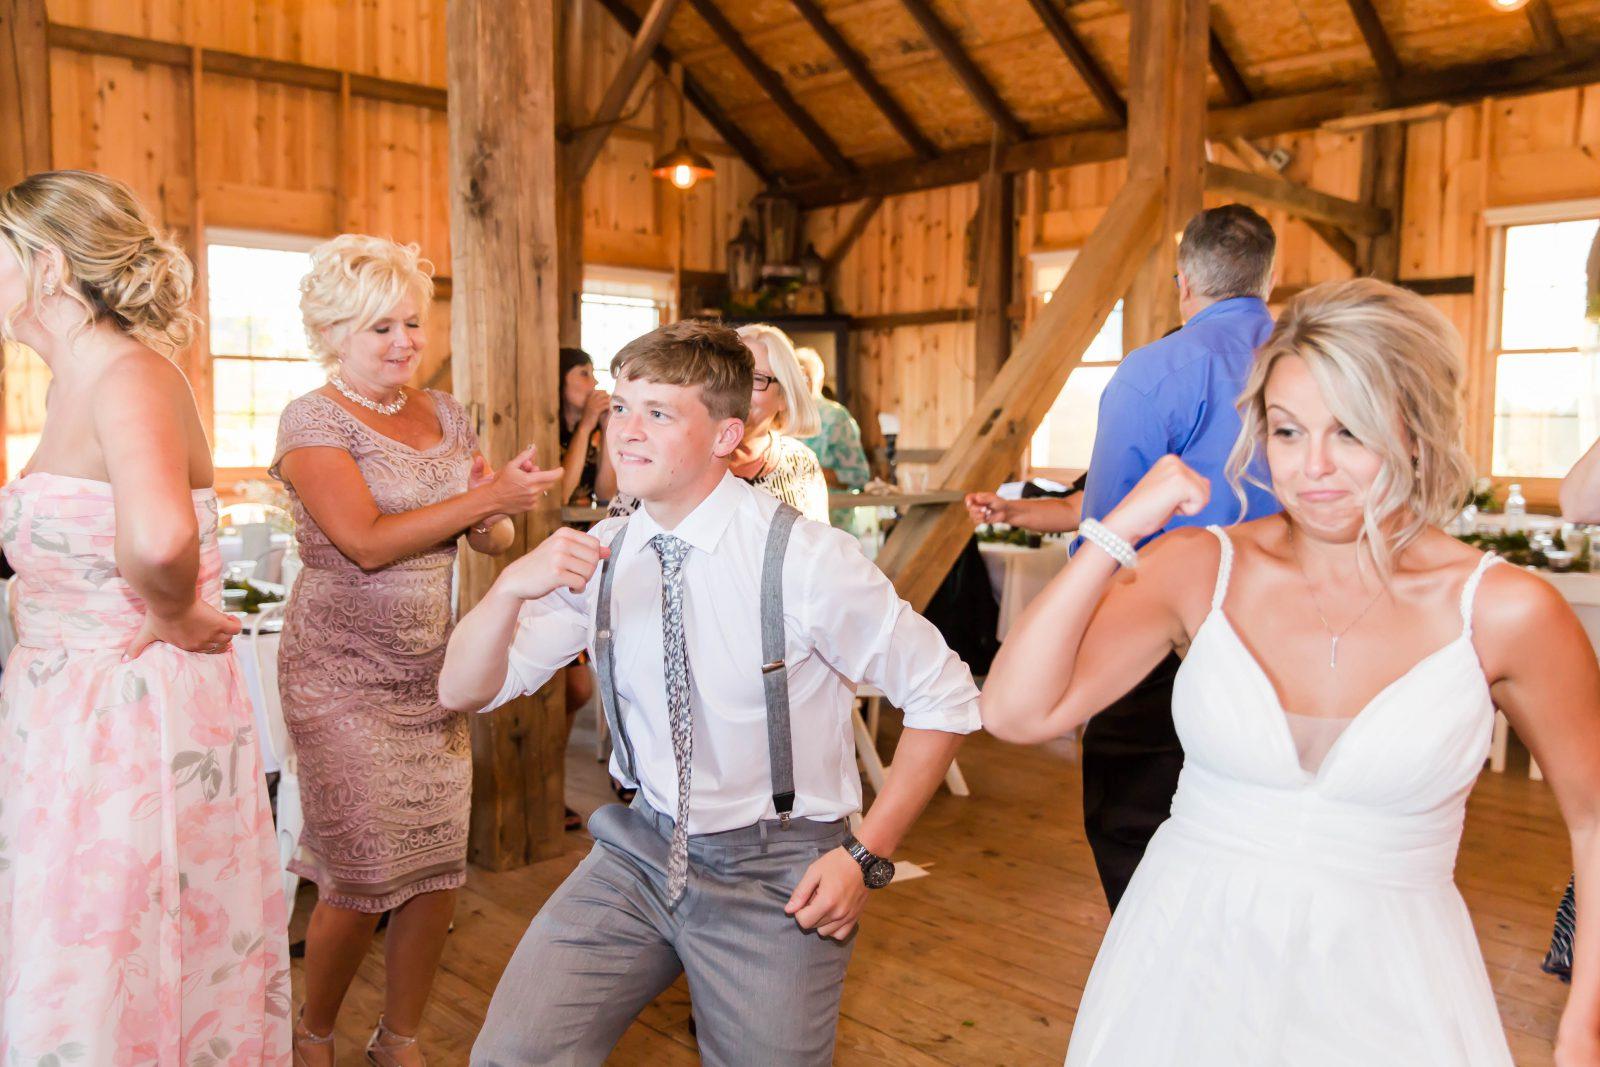 peacock-ridge-summer-wedding-photographer-akron-ohio-loren-jackson-photography-111